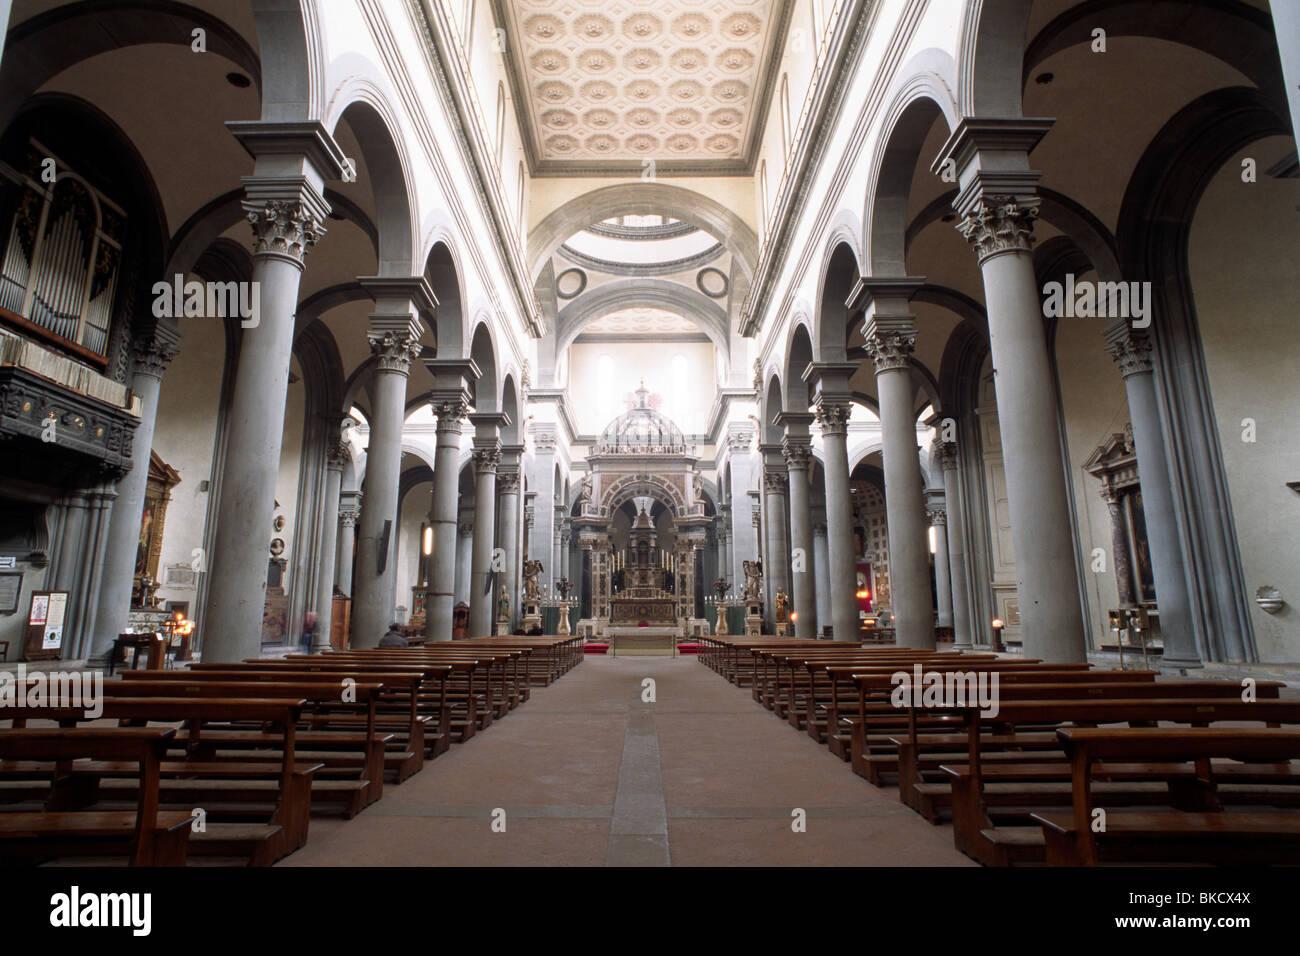 italy, tuscany, florence, church of santo spirito - Stock Image